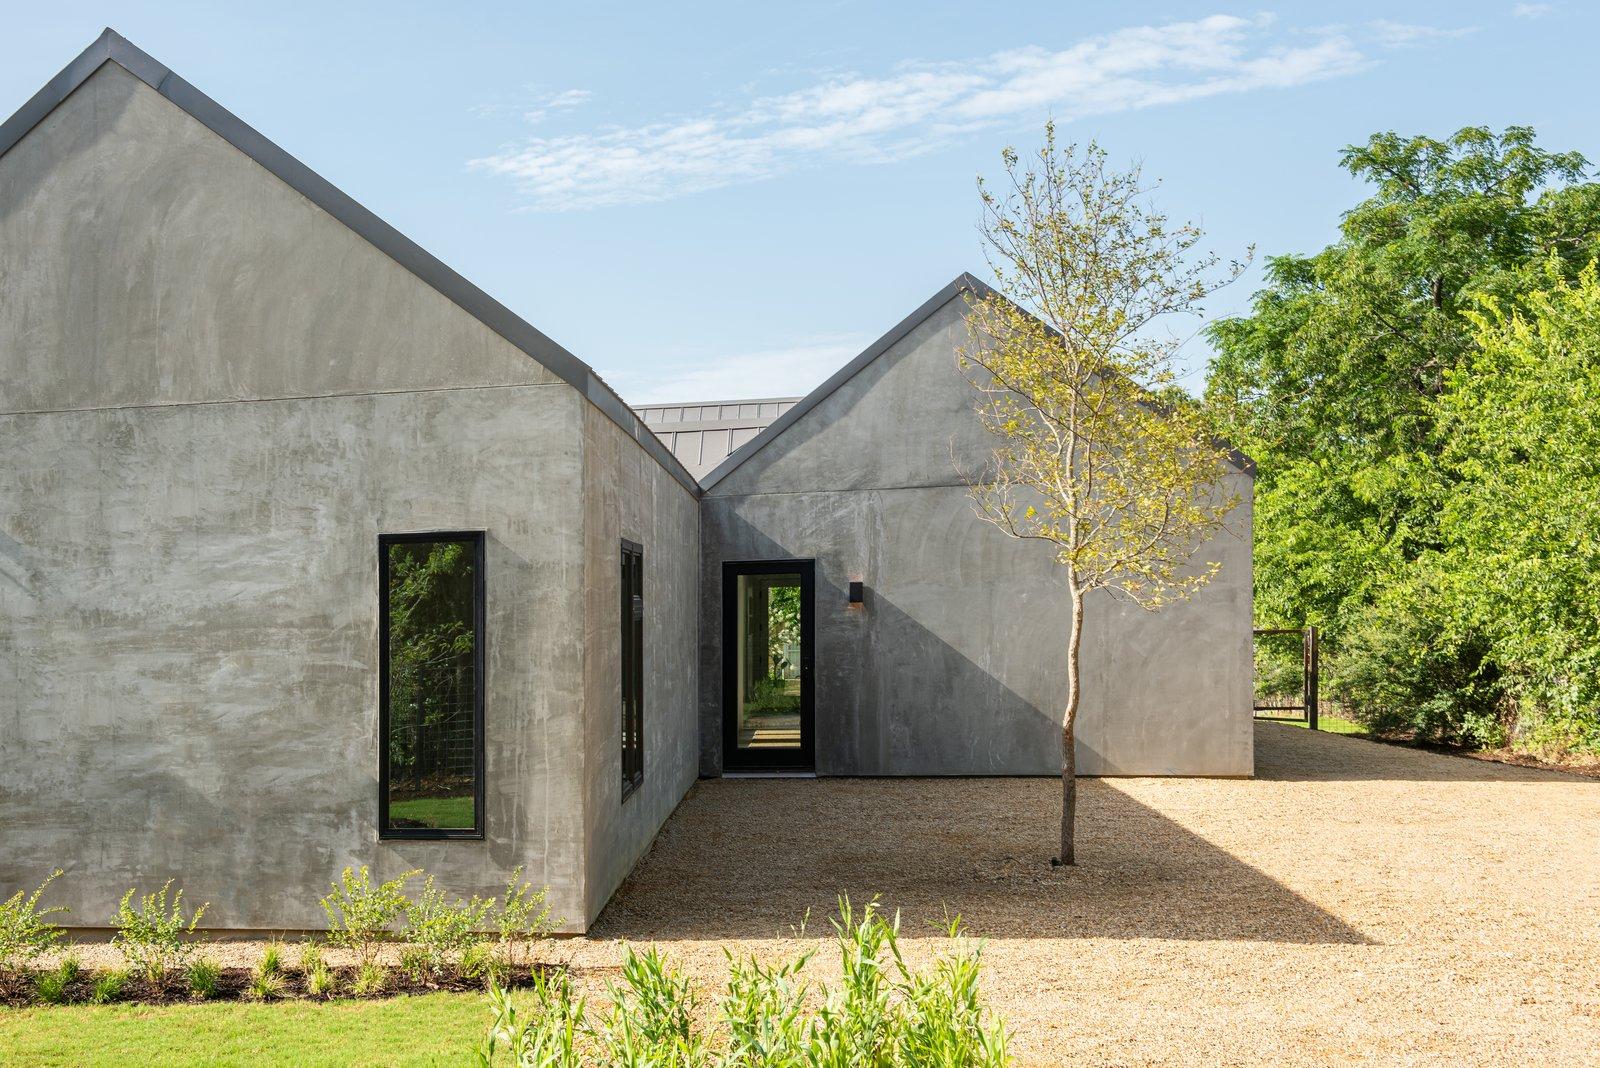 Exterior of Haciendas house by Lake Flato